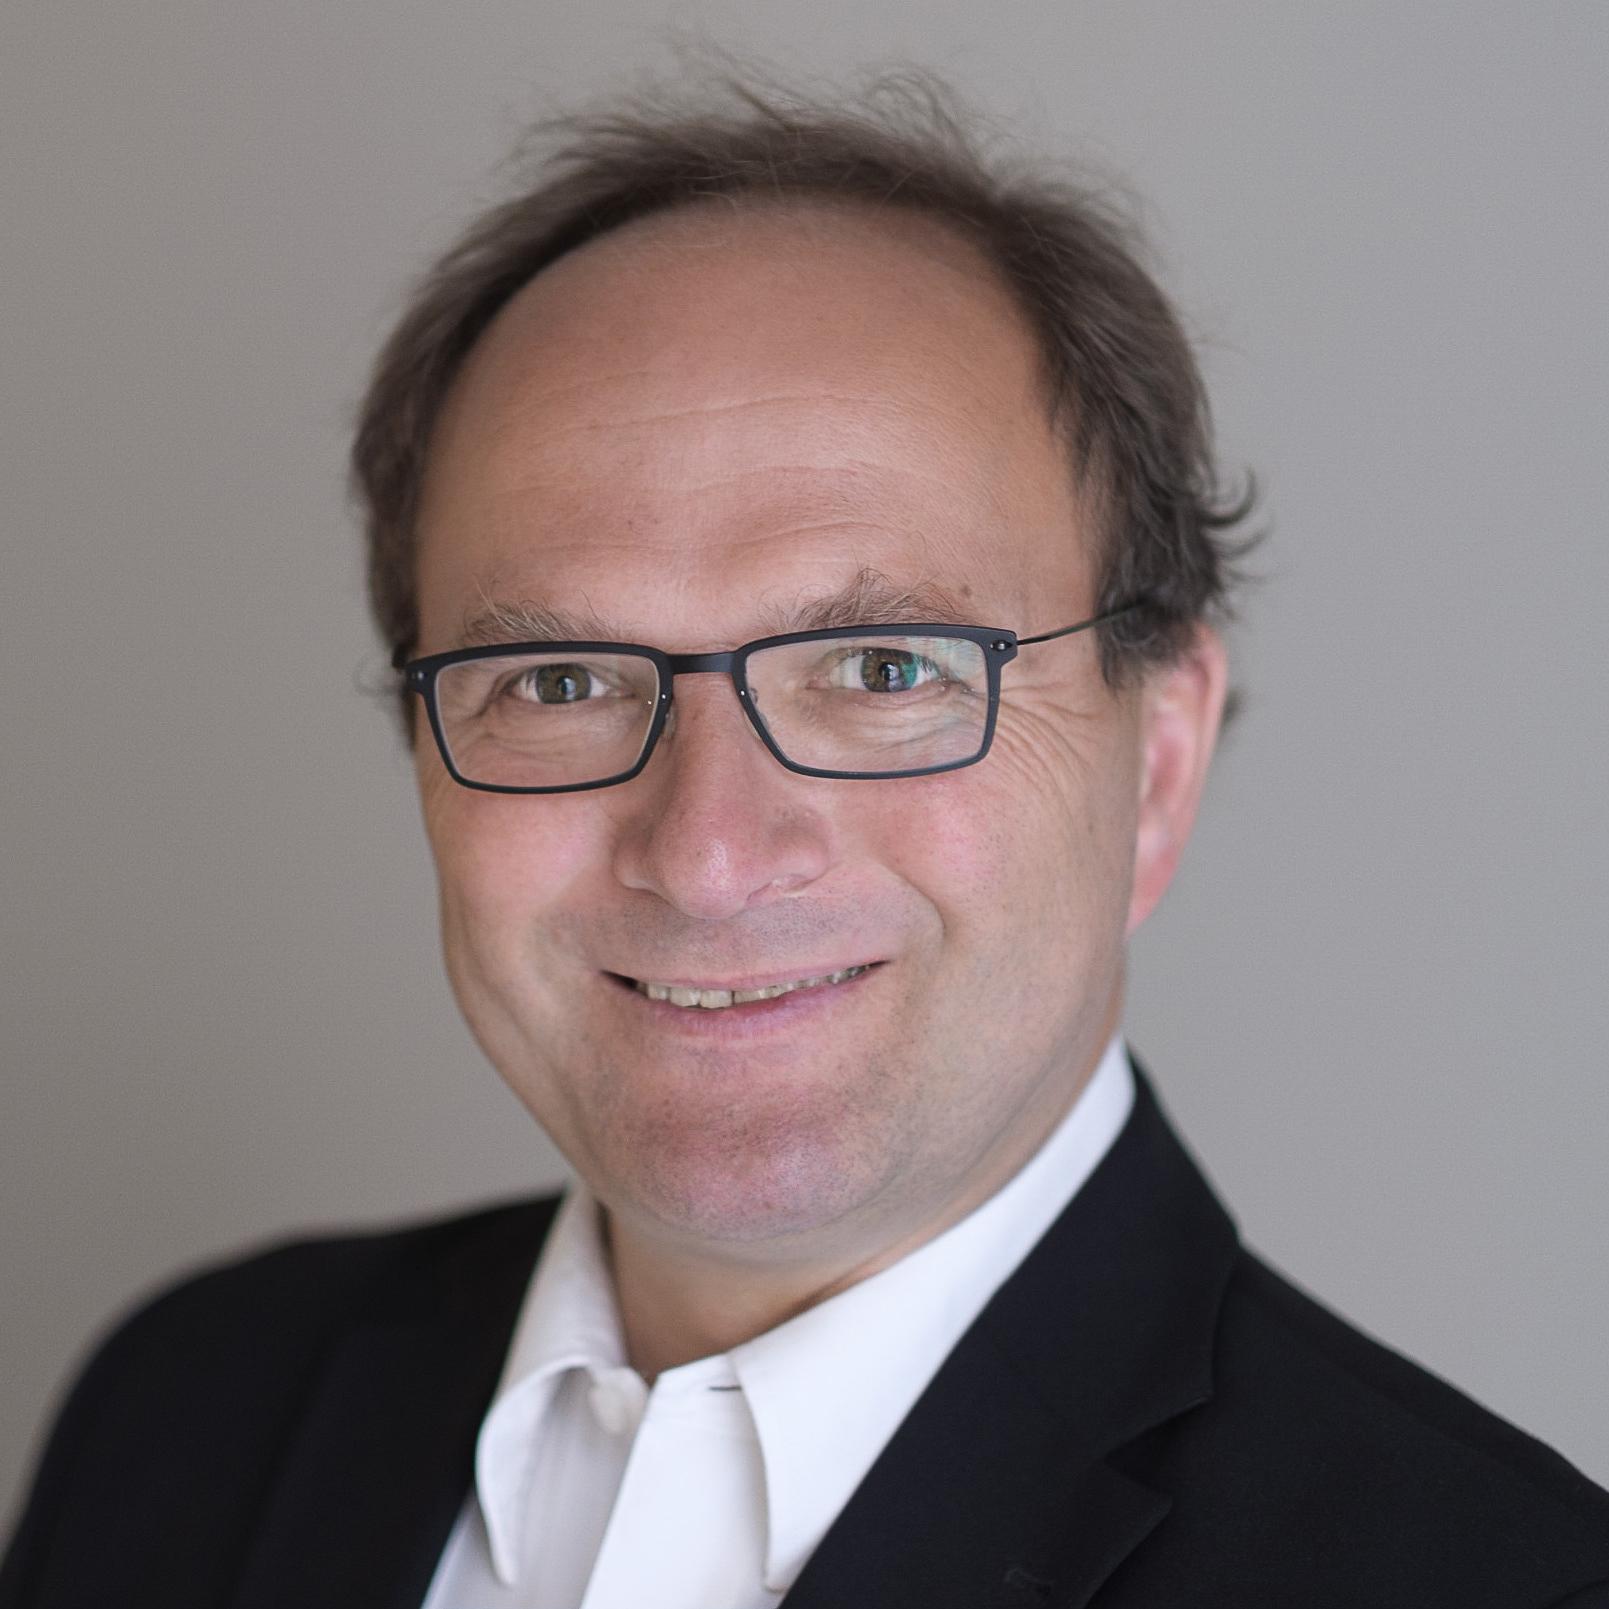 Prof. Dr. Axel Sikora, Hahn-Schickard